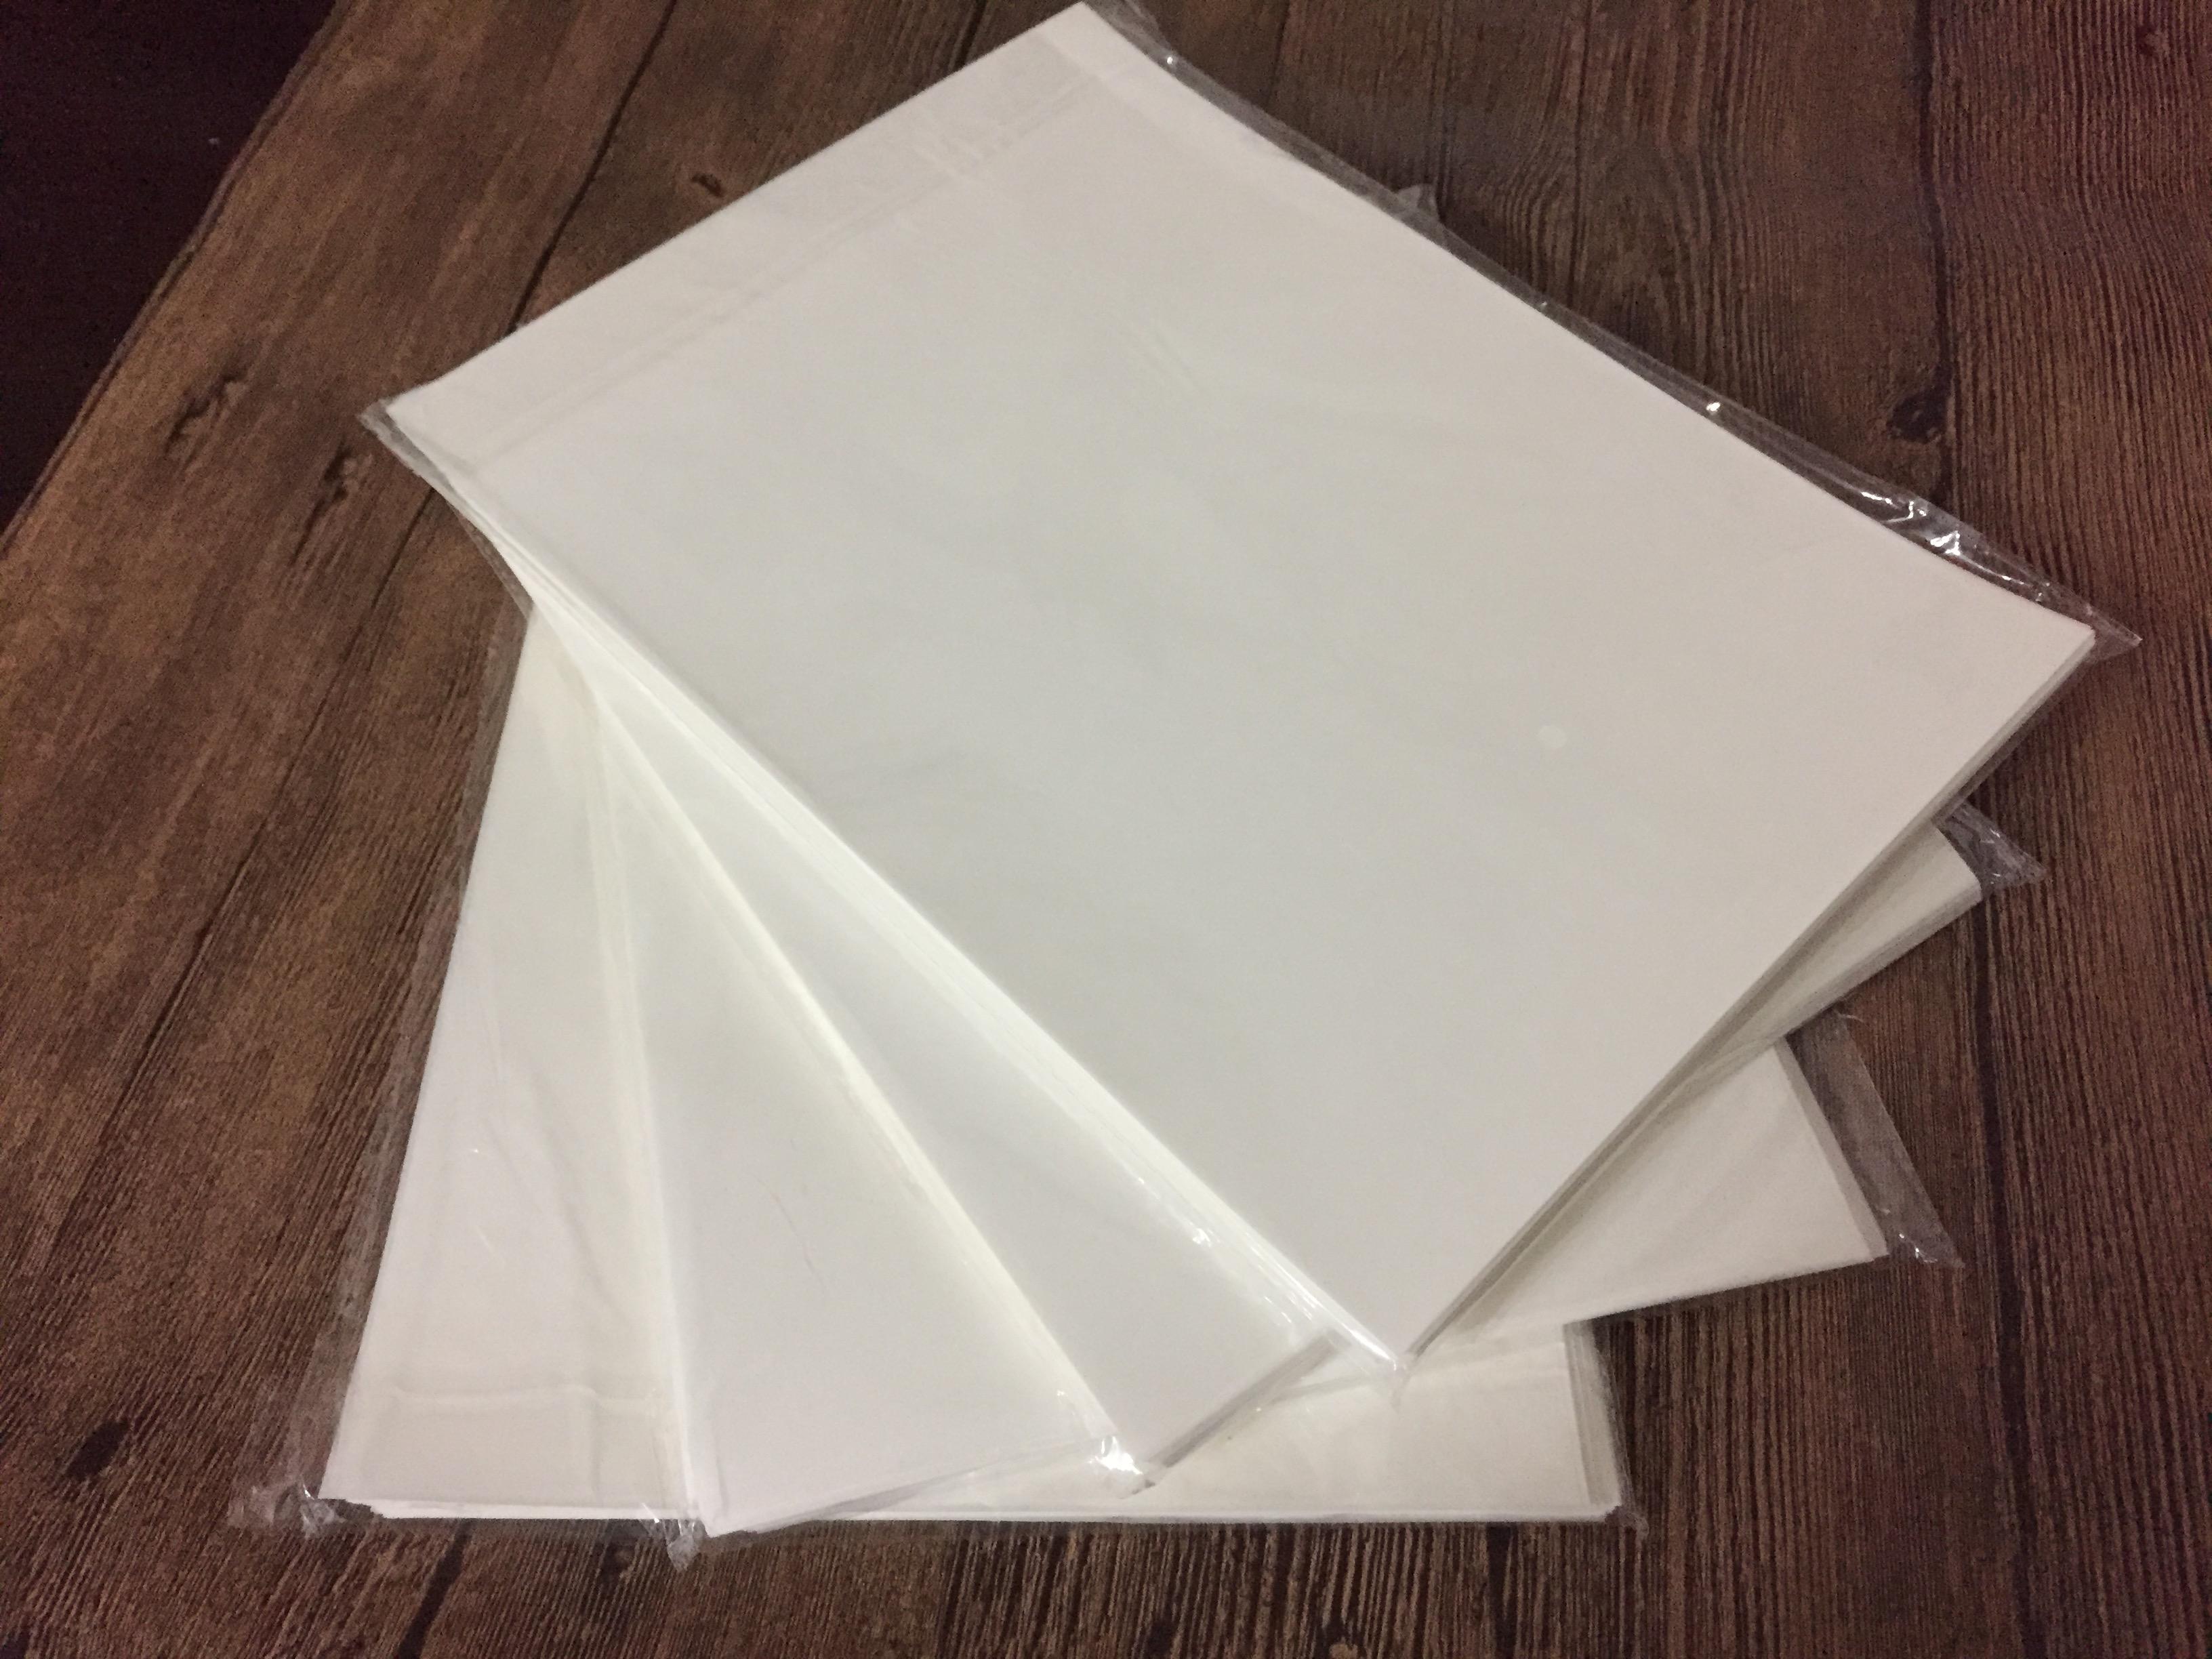 A4a5单双面硅油纸防粘离型手帐底纸隔离膏药纸规格可定制全国包邮